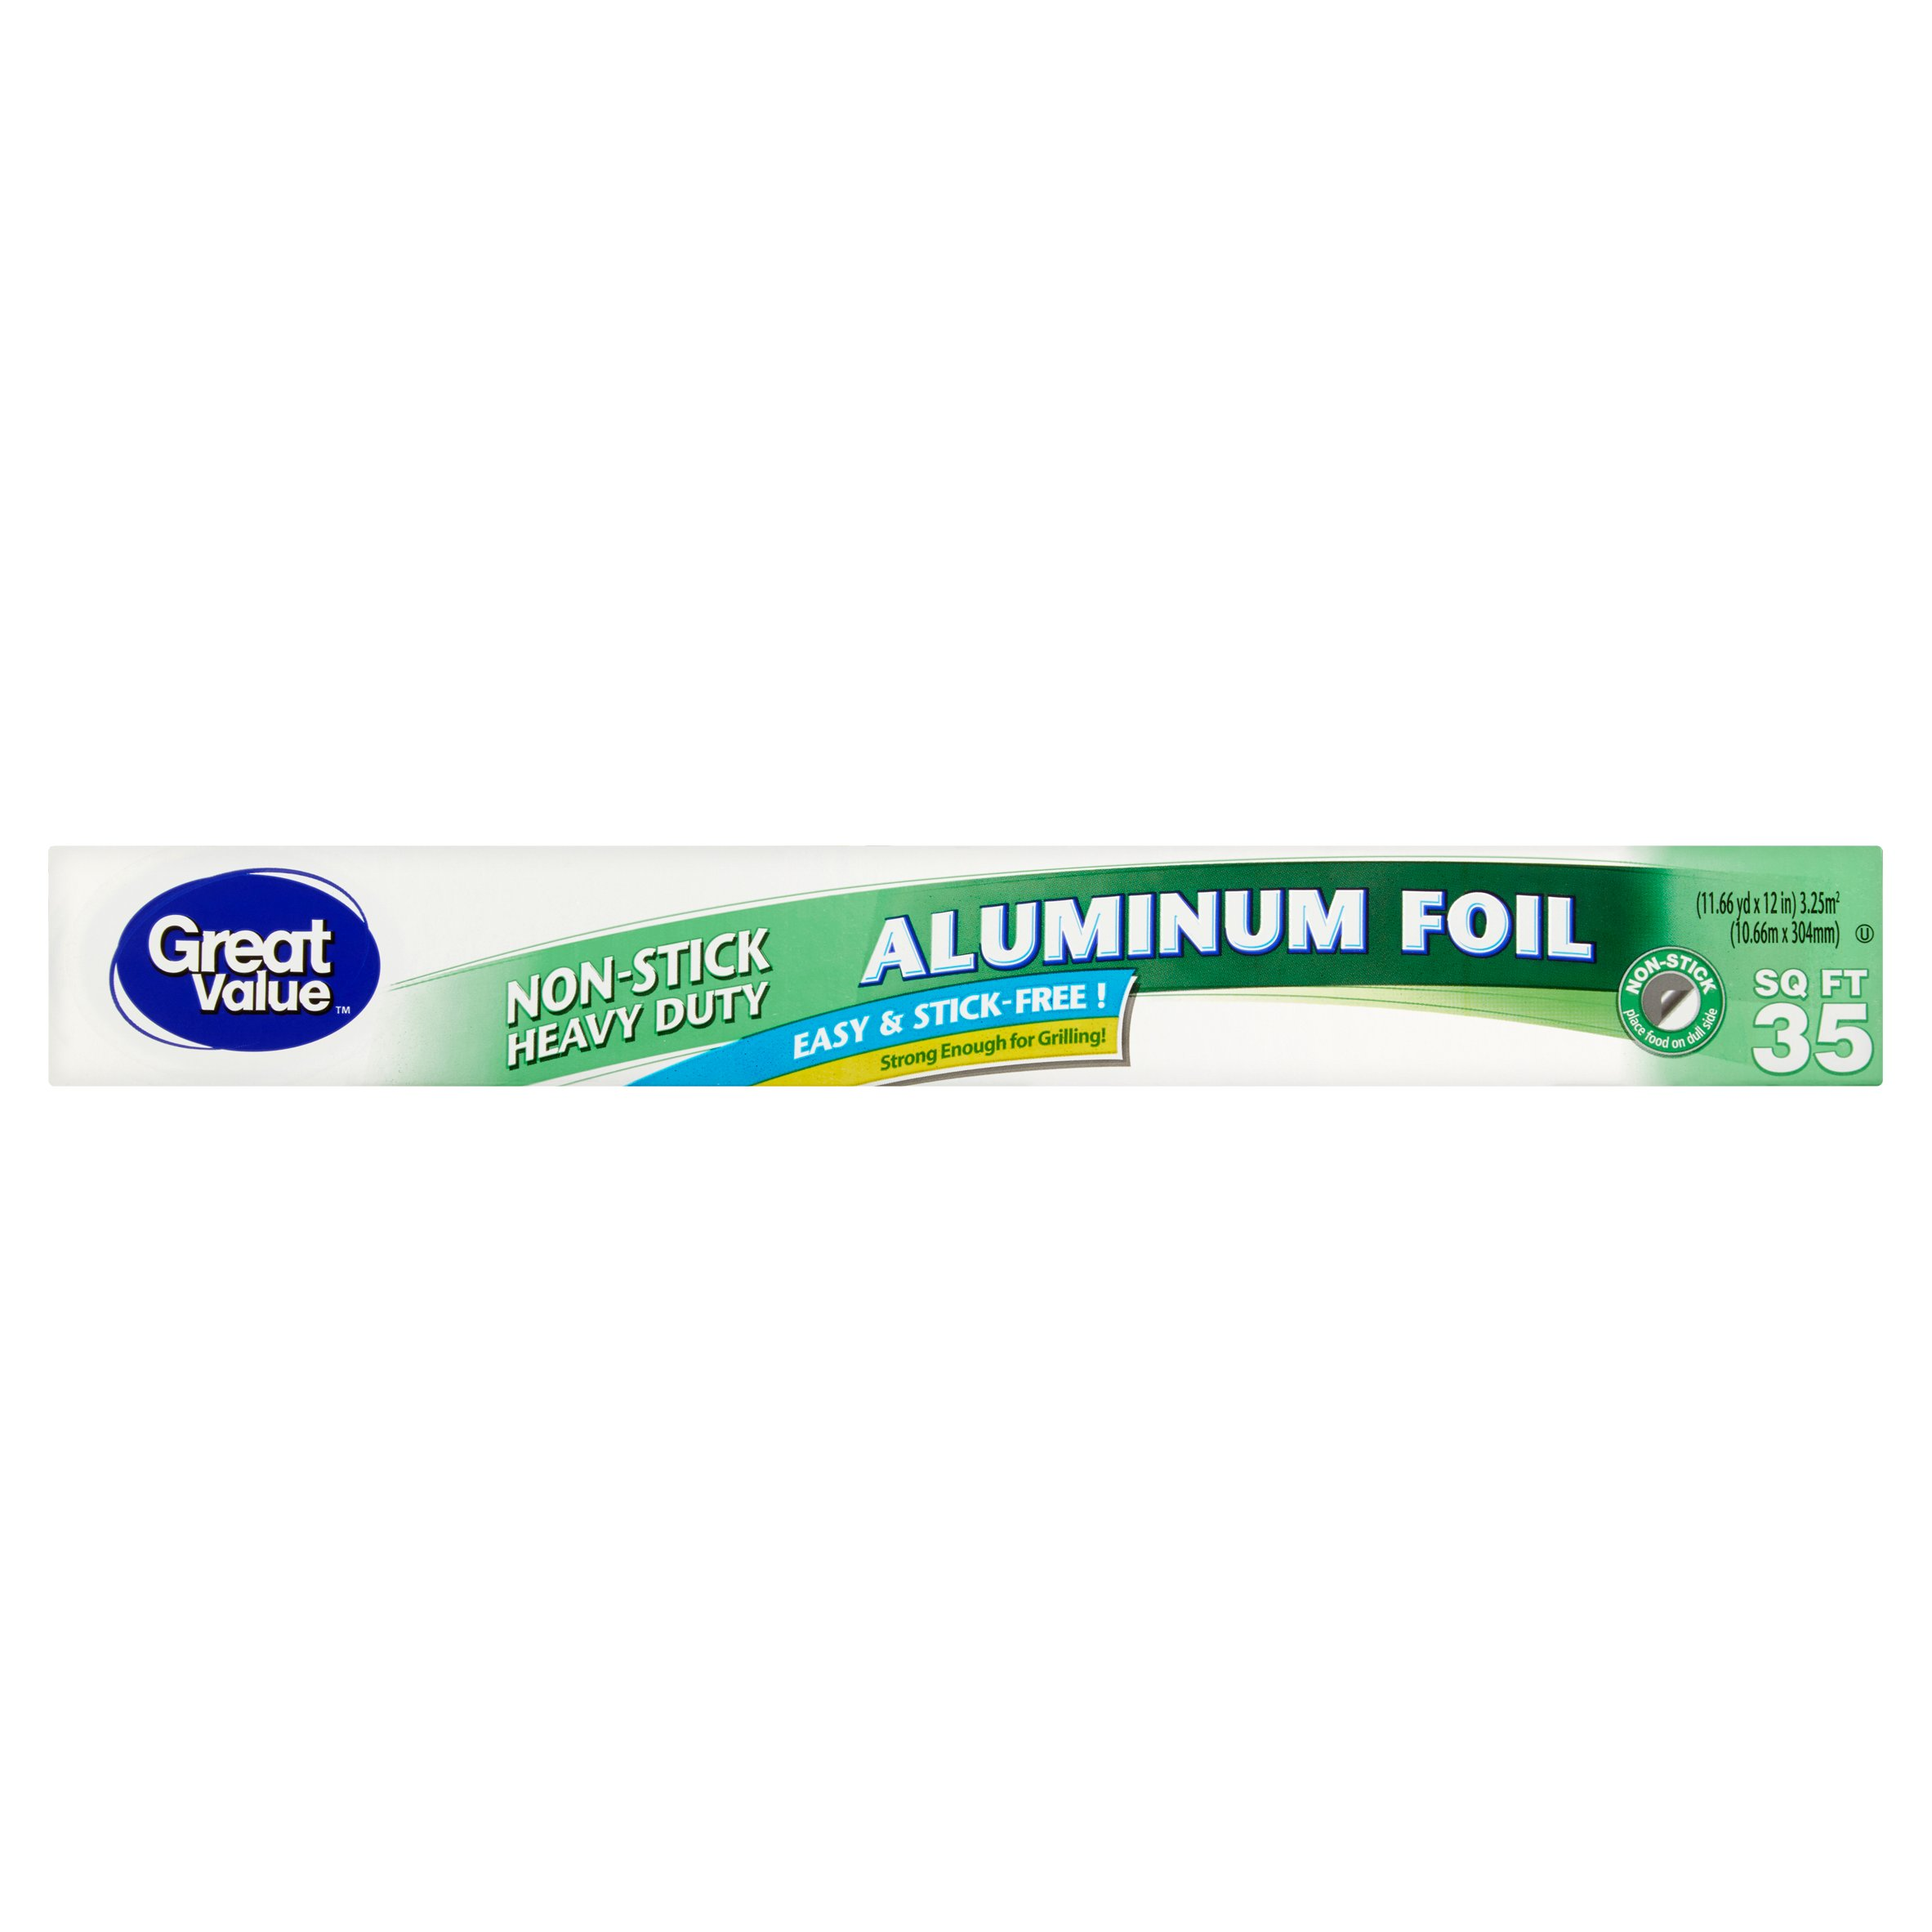 Reynolds Wrap Heavy Duty Non-stick Aluminum Foil 6 Packs 35 Sq Ft Each New